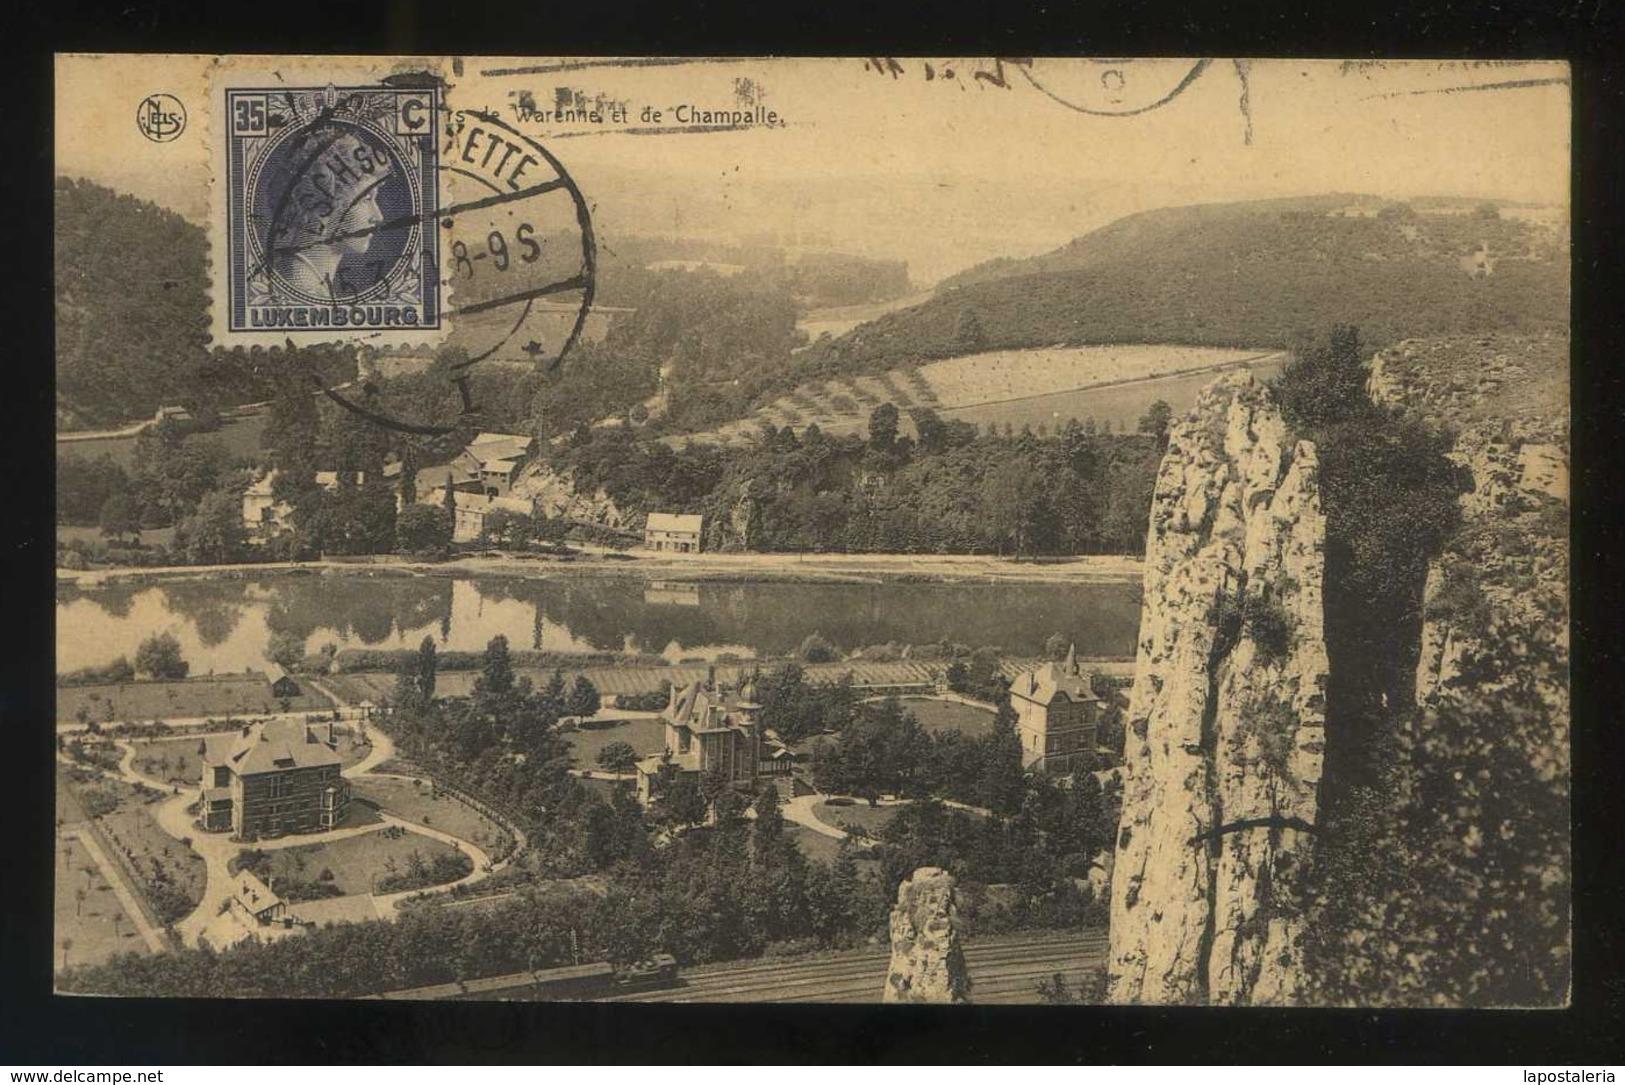 Luxemburgo. *Rochers De Warenne Et De Champalle* Circulada 1930. - Luxemburgo - Ciudad